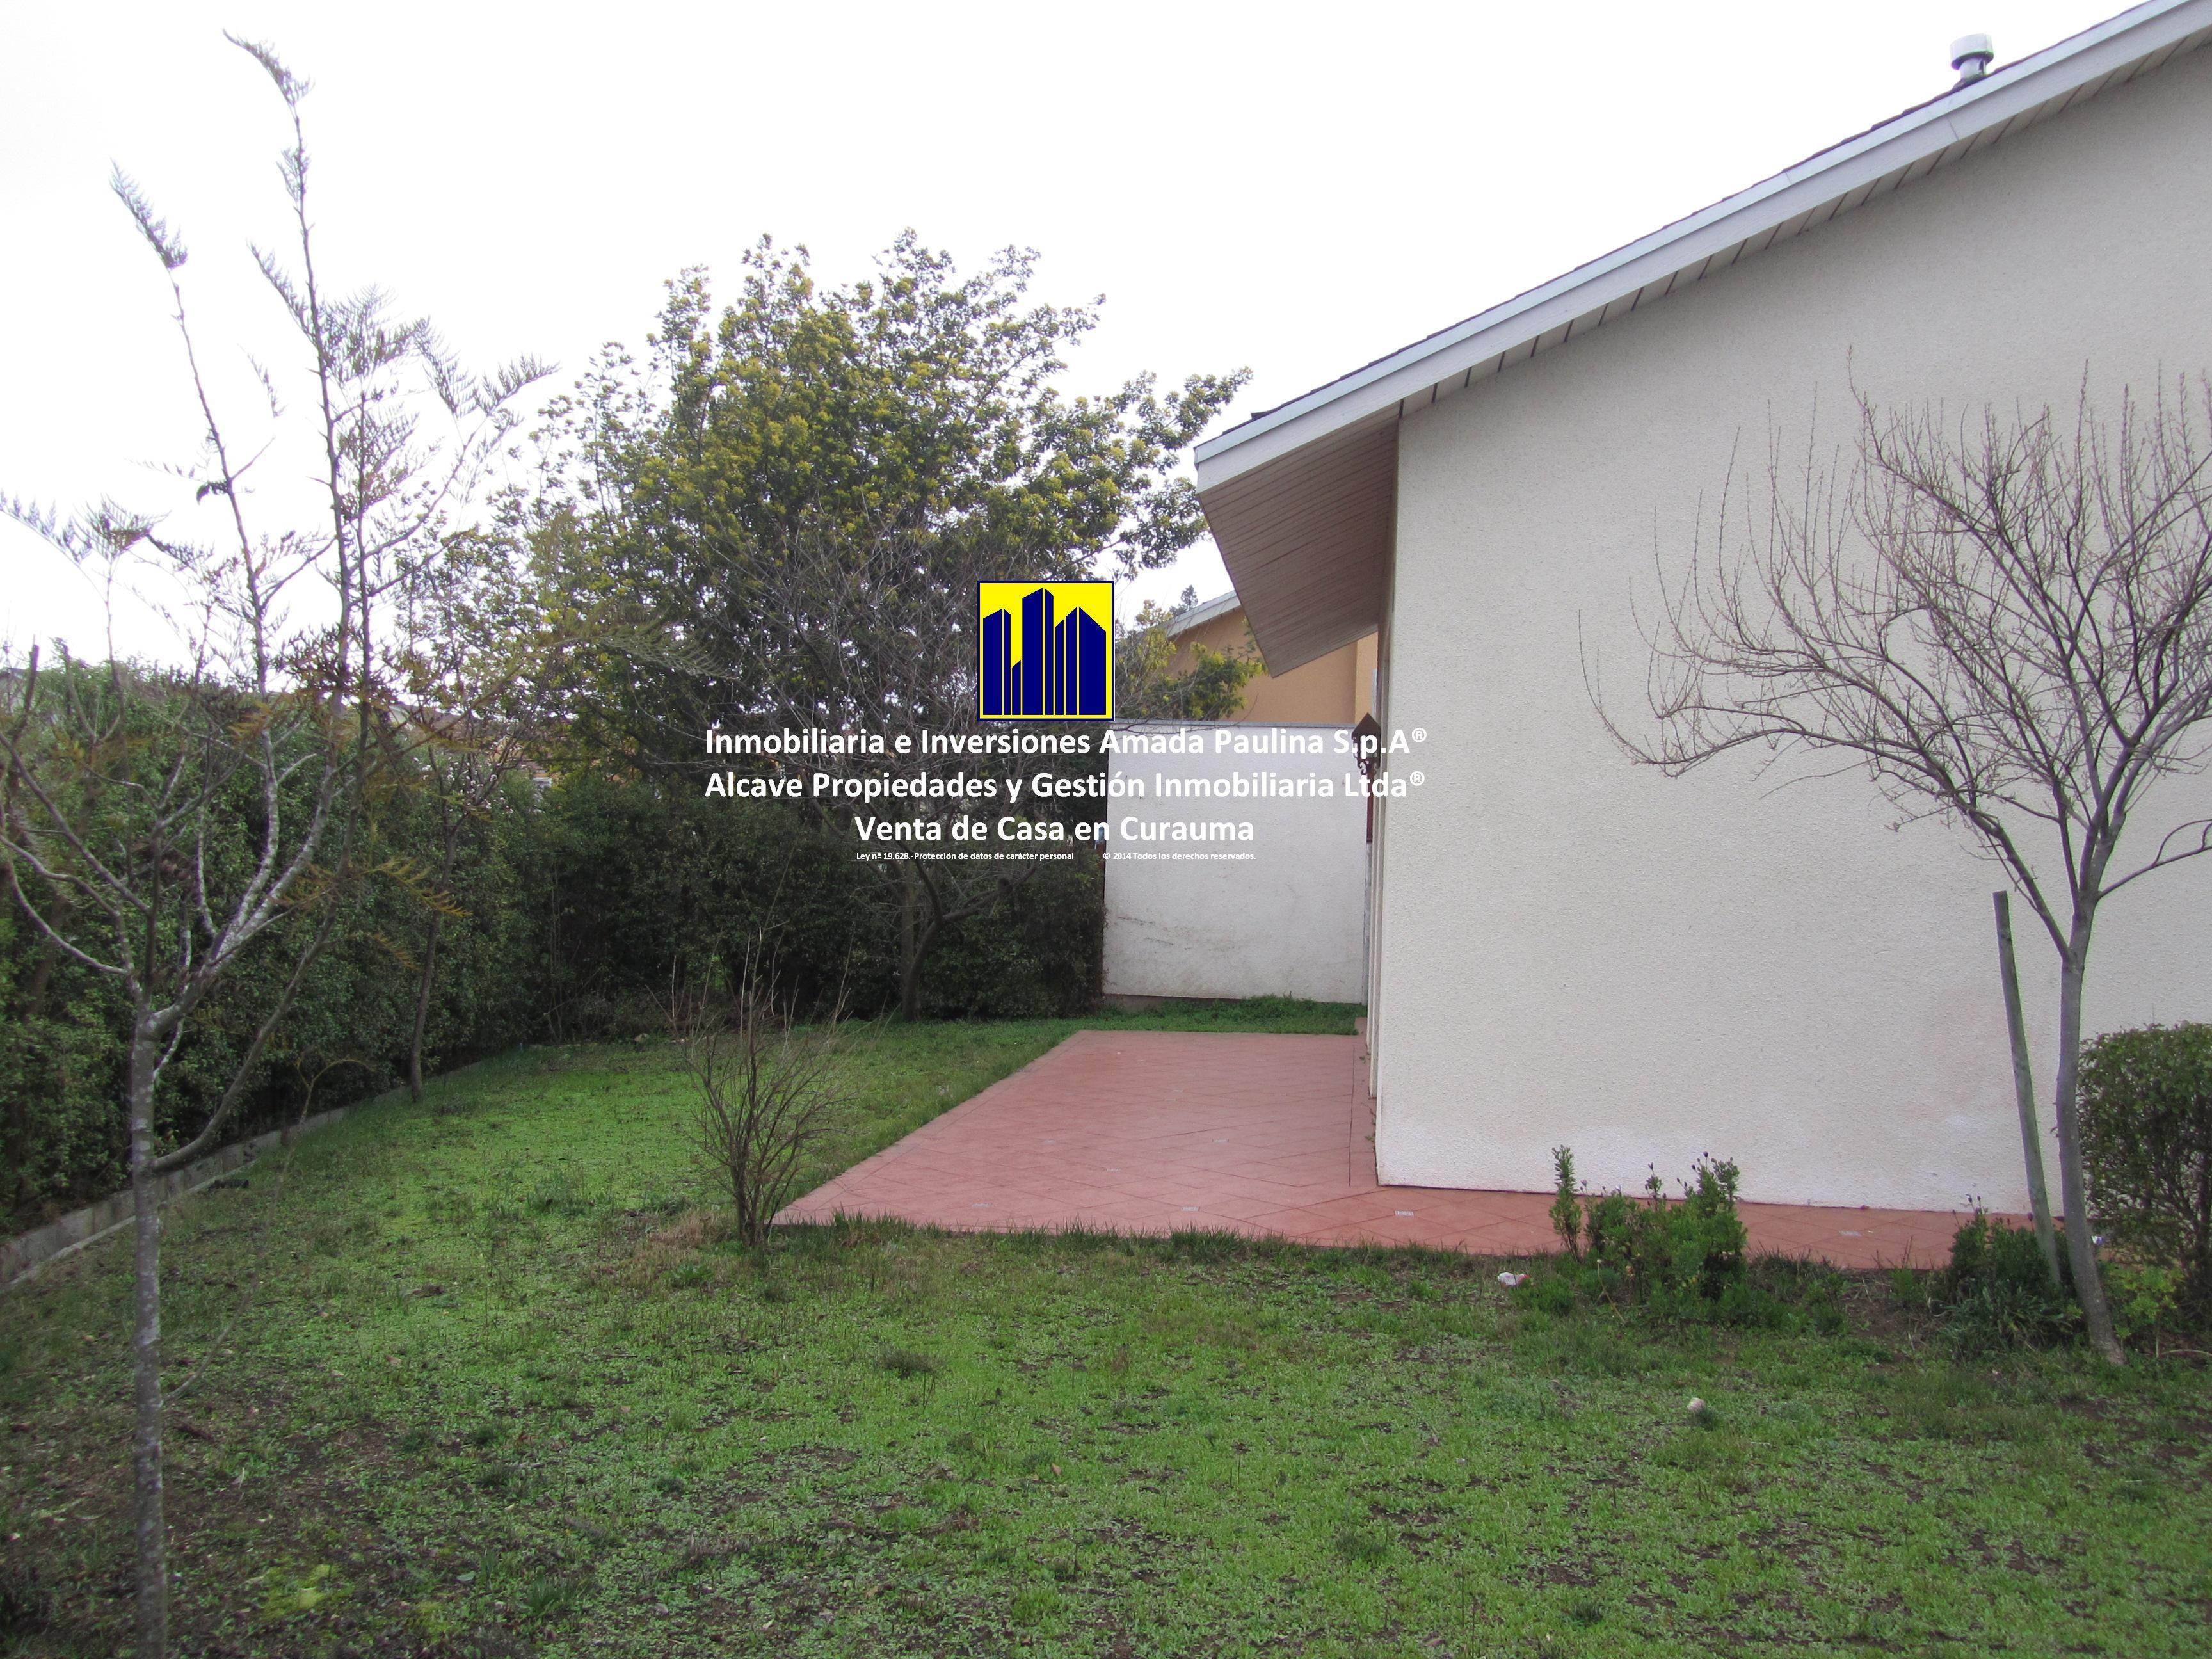 16.Inmobiliaria e Inversiones Amada Paulina S.p.A® Alcave